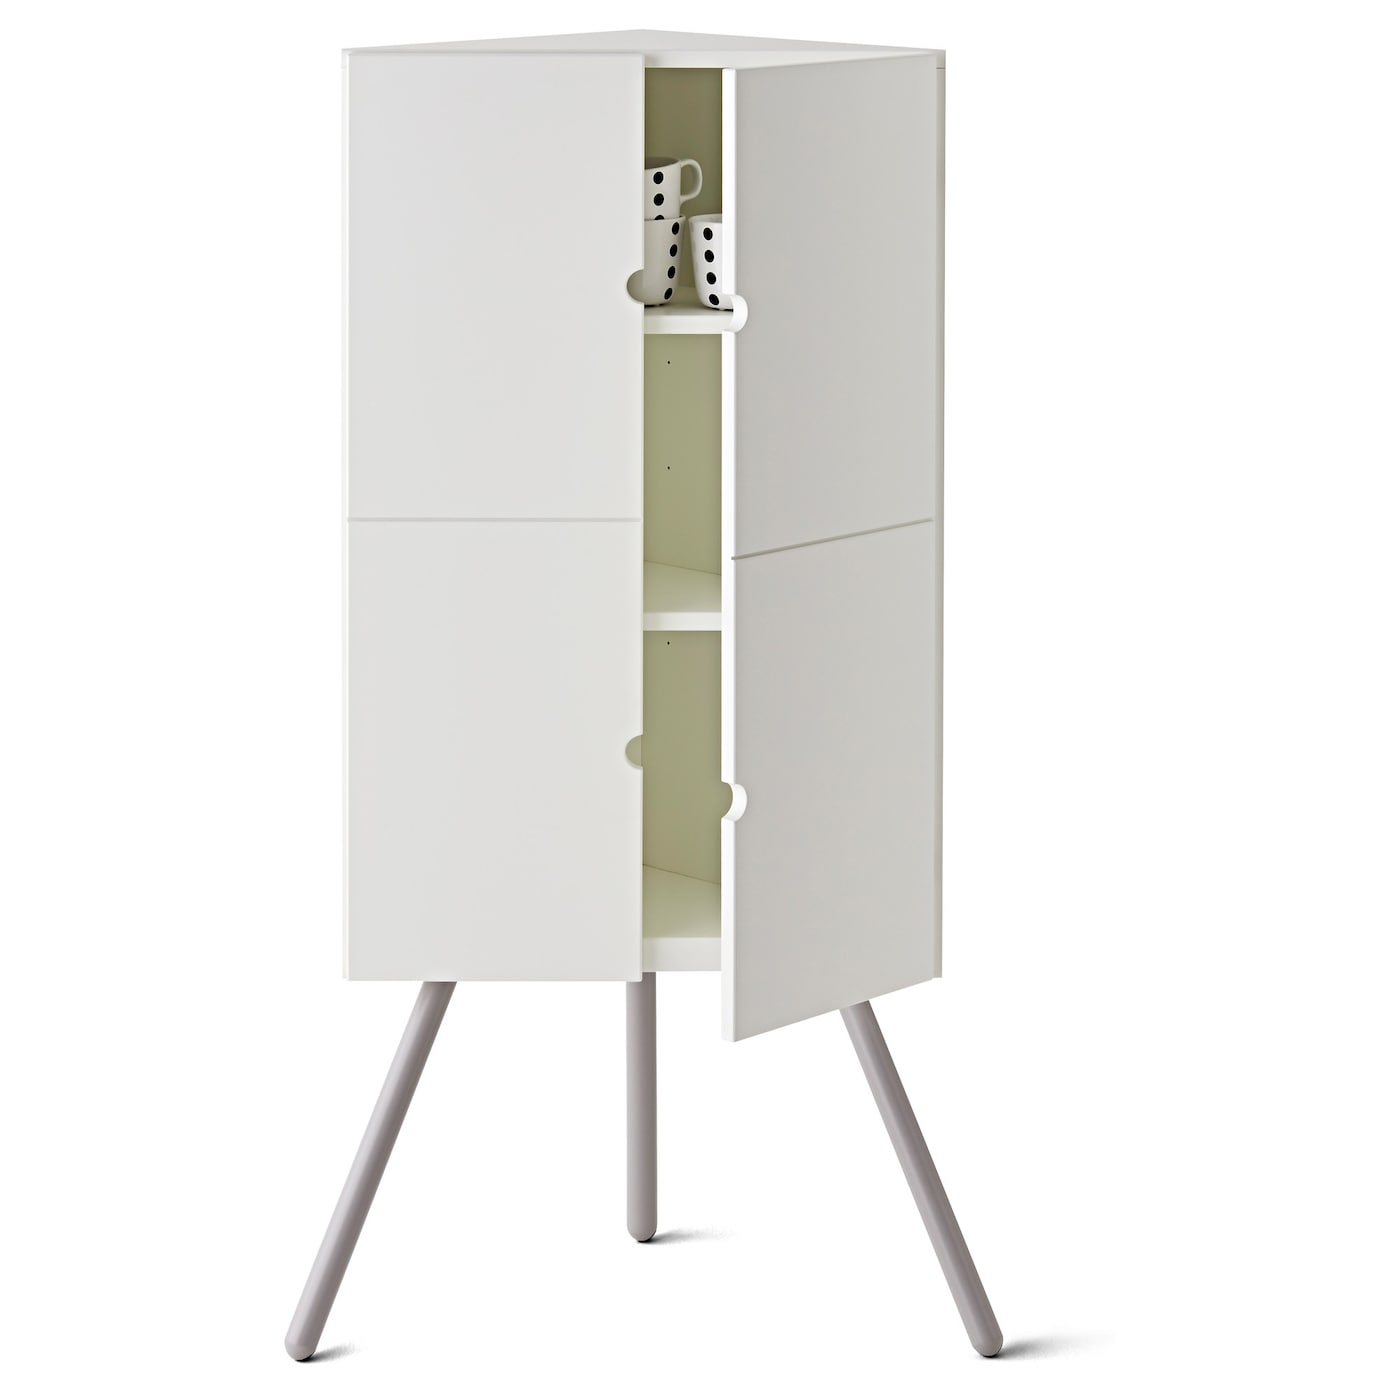 Ikea Ps 2014 Corner Cabinet White Grey__0277886_pe412743_s5 Bathroom Corner  Cabinet